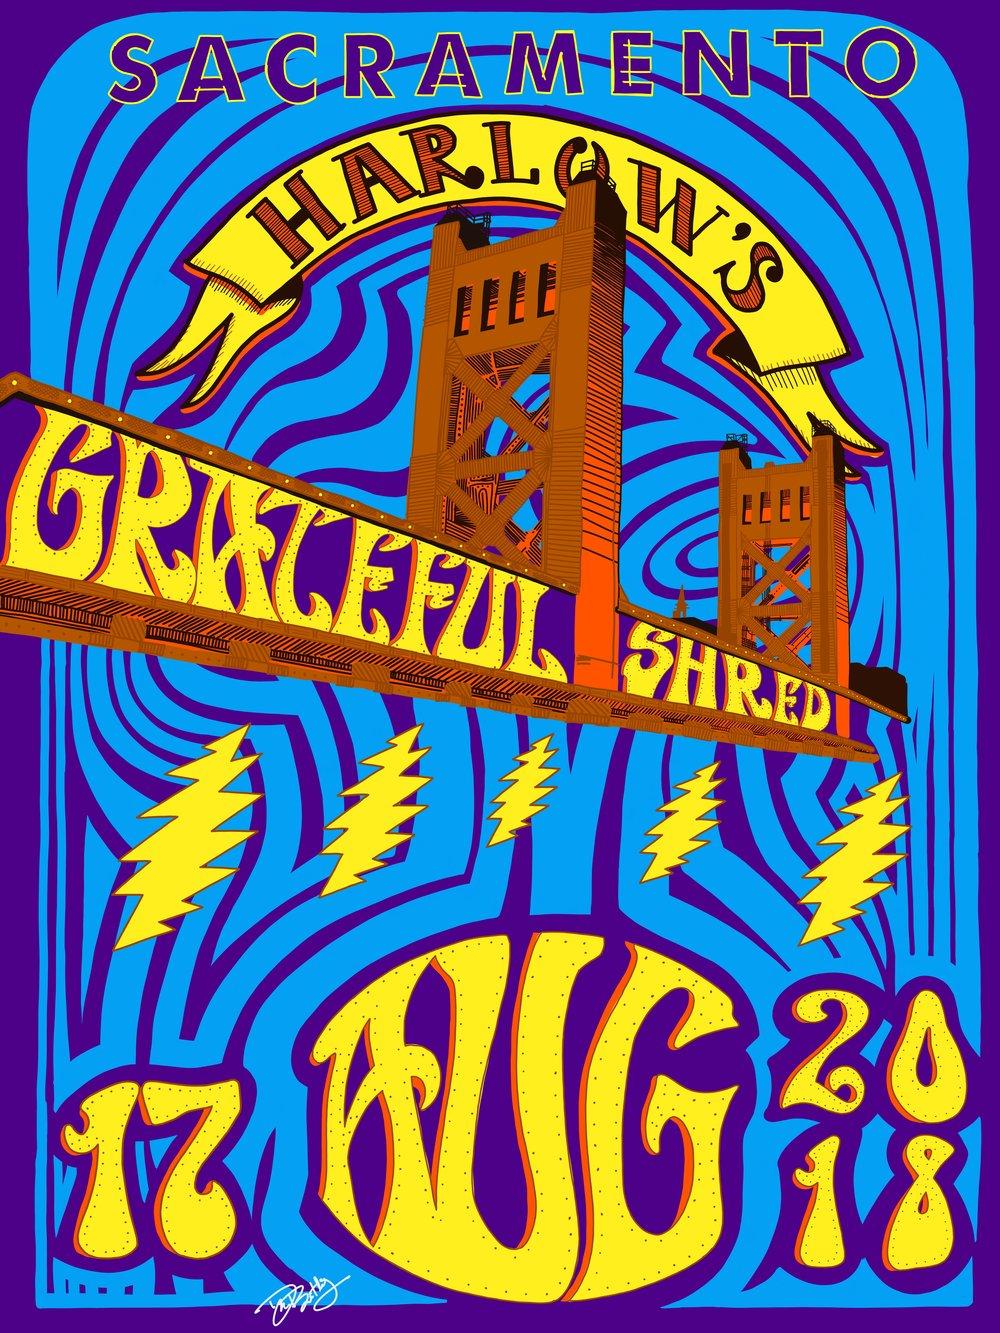 Grateful Shred Harlows 8.17.18.jpg